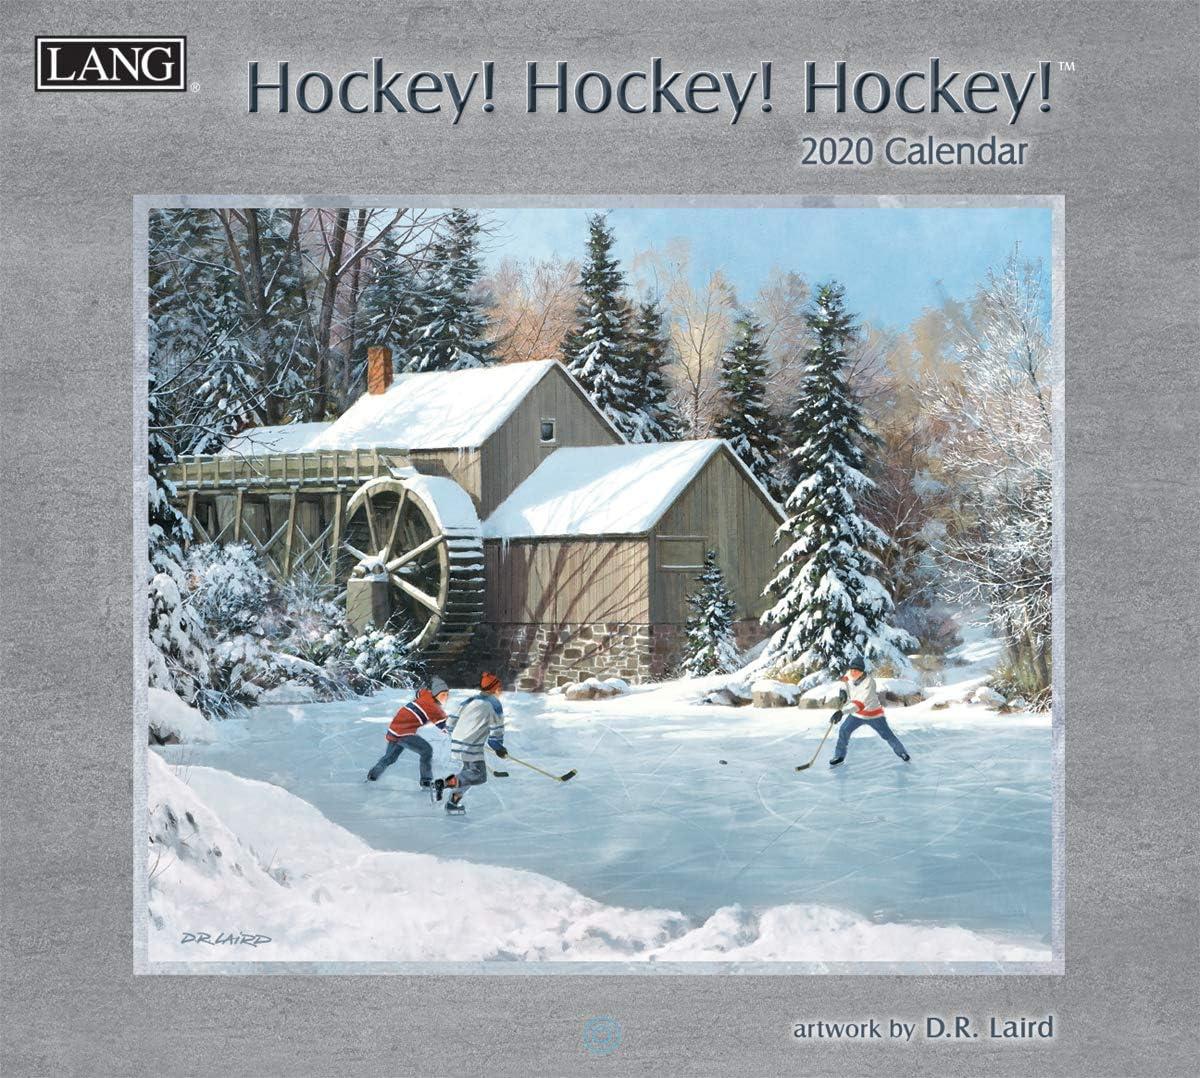 Lang Hockey Hockey Hockey 2020 Wall Calendar (20991001916)